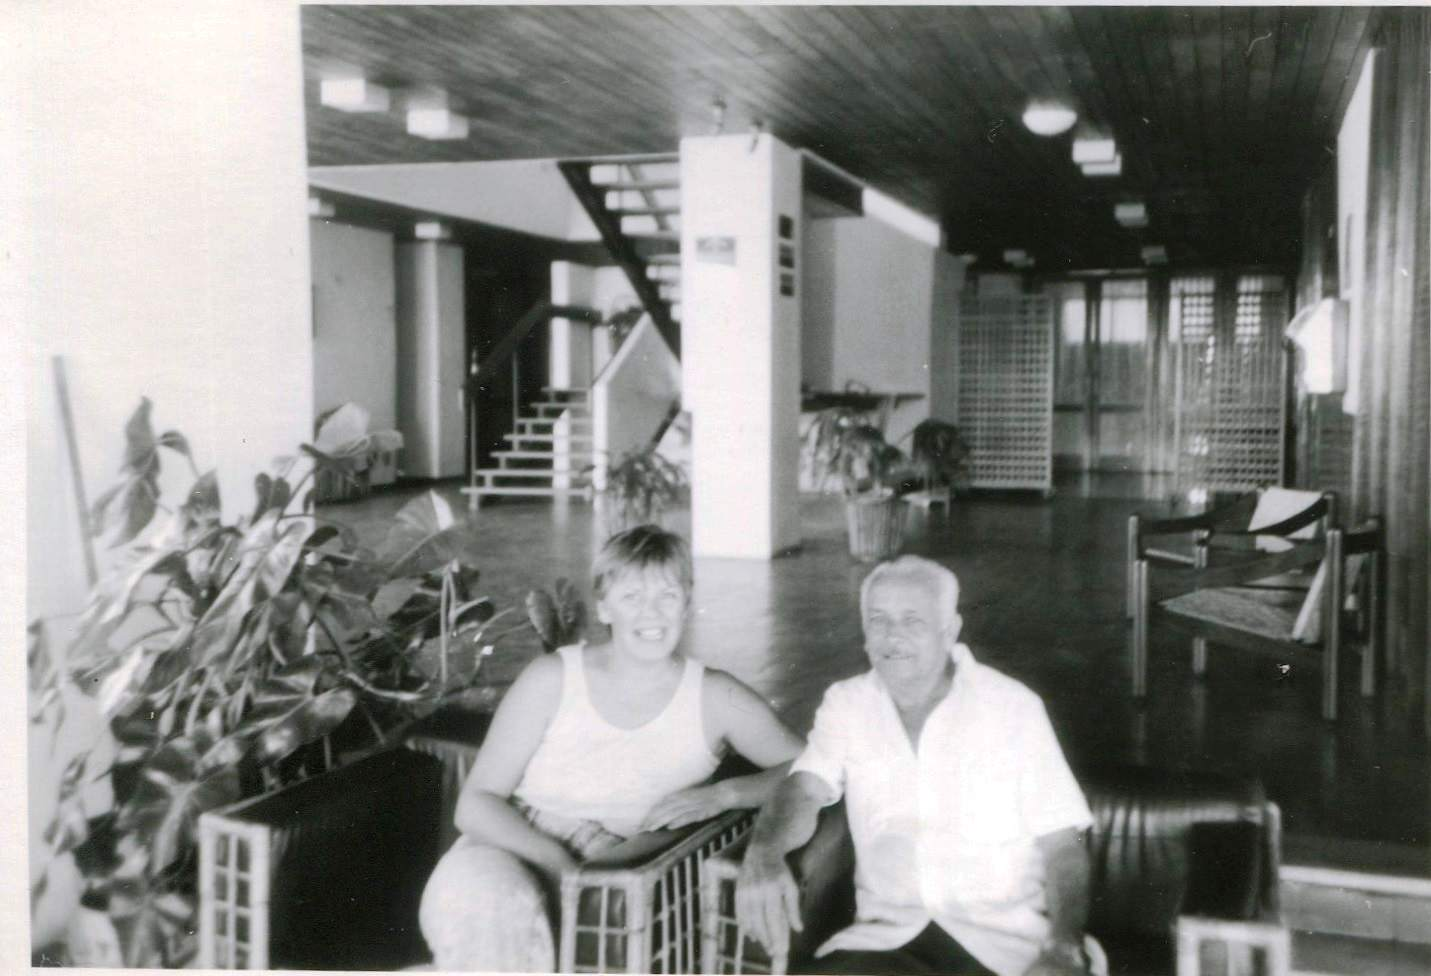 1989. Баракоа. В гостинице, фото 3